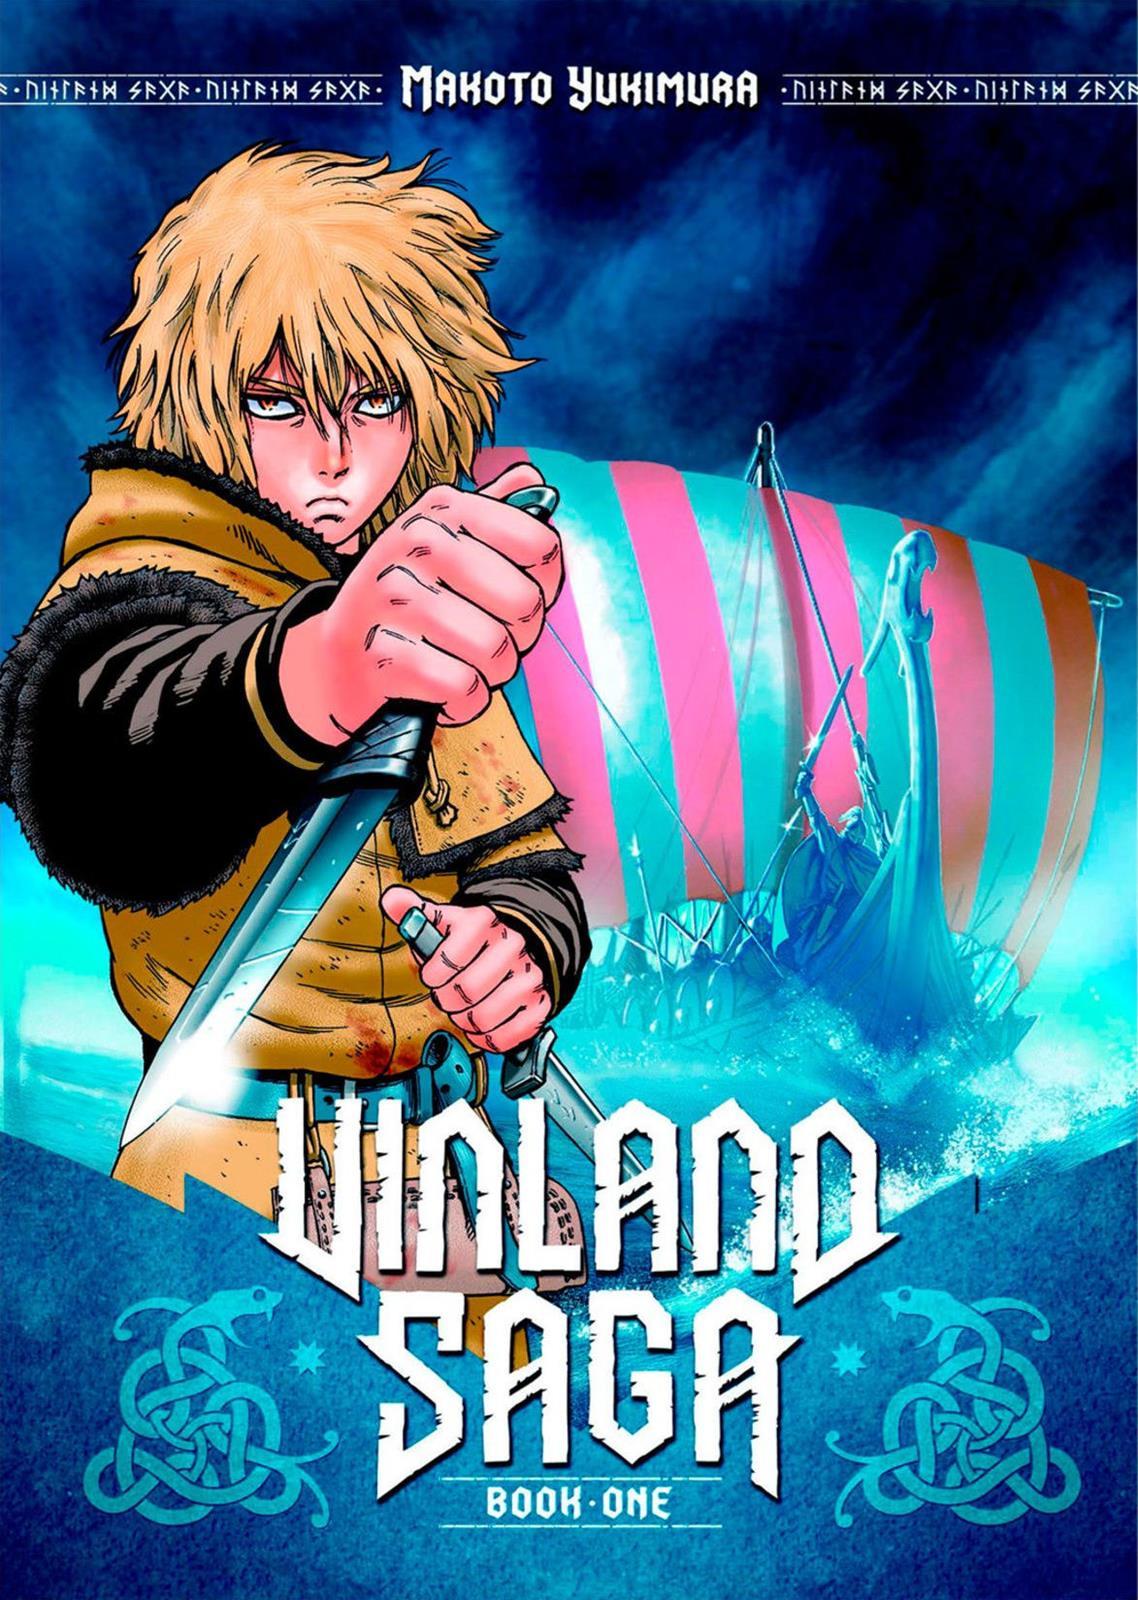 Vinland Saga Chapter 1 Normanni Mangahasu Search results related to mangahasu on search engine. mangahasu